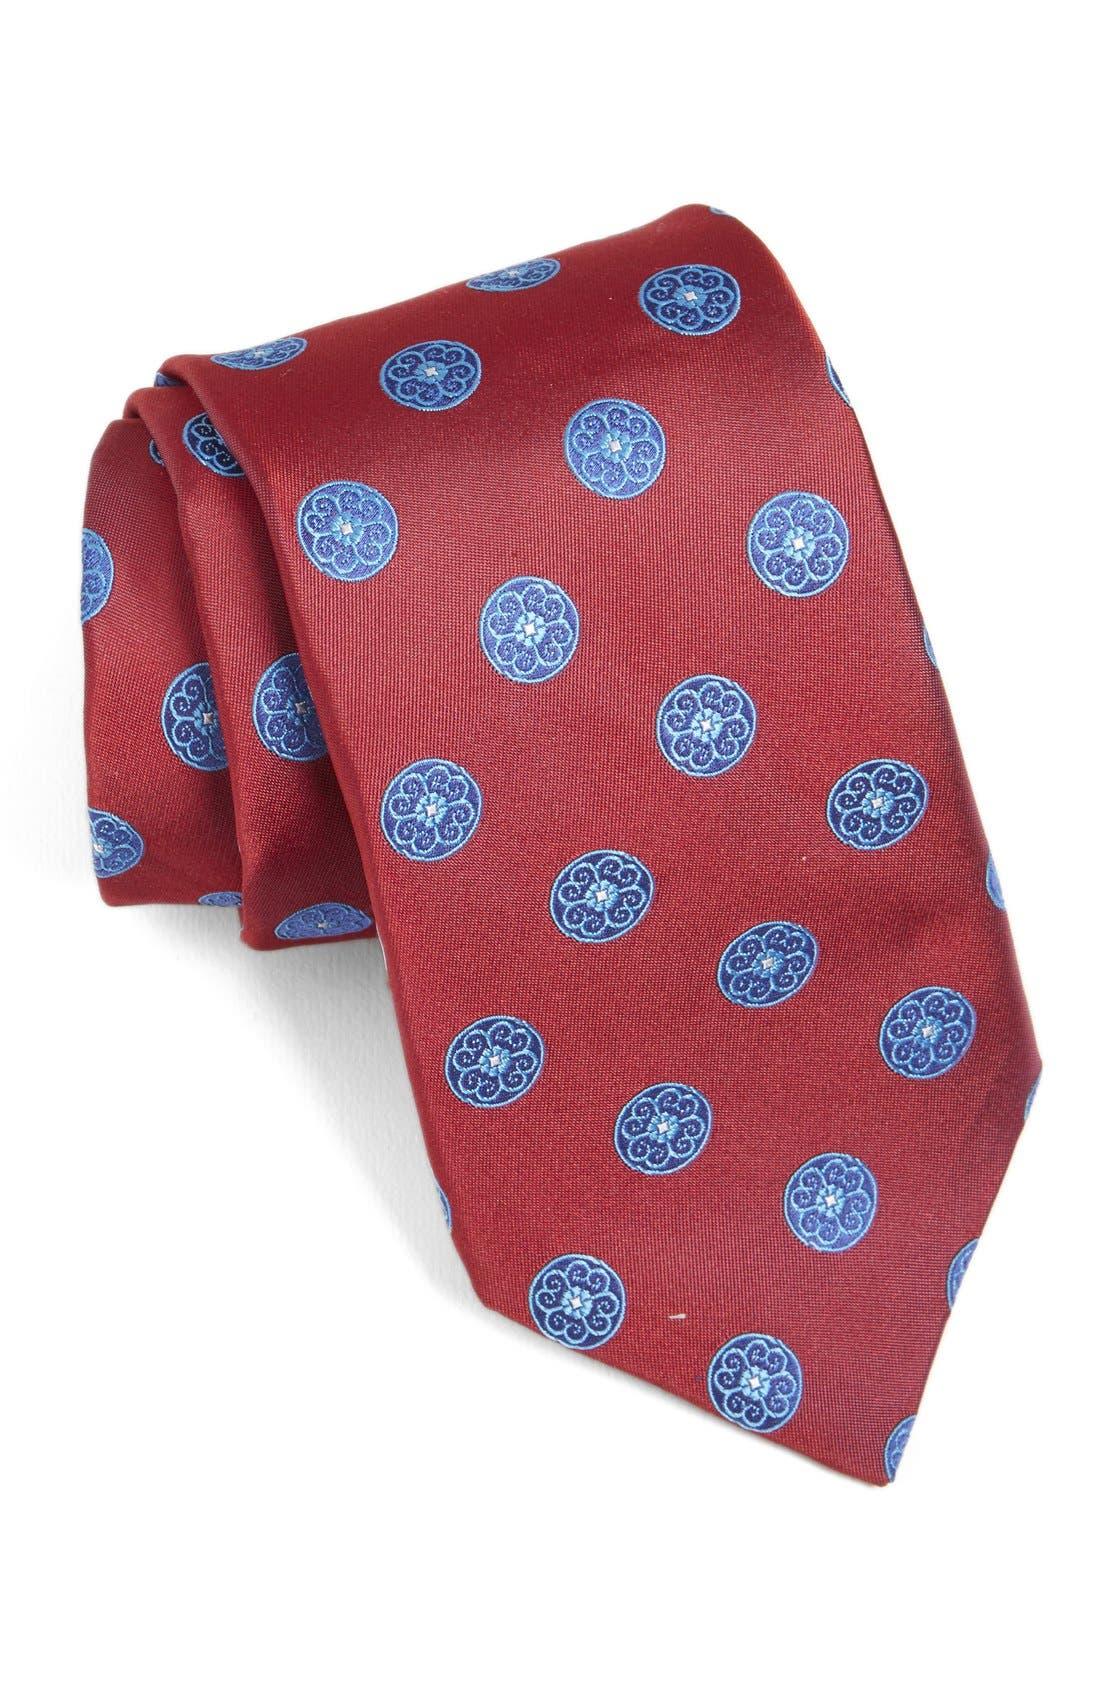 Main Image - Ted Baker London Medallion Woven Silk Tie